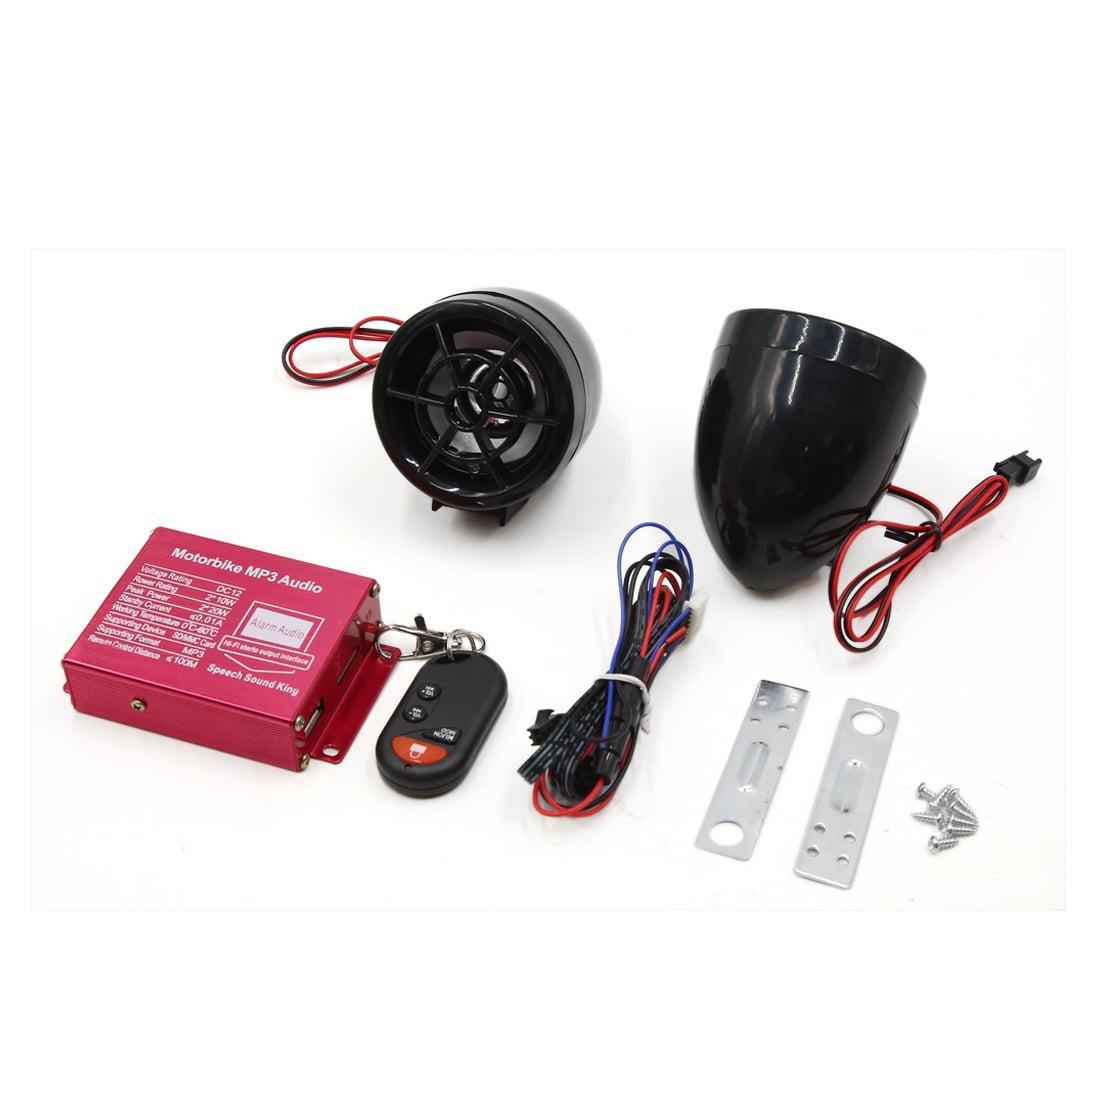 2Pcs Motorcycle MP3 SD USB Amplifier Speaker  Alarm Audio Stereo DC 12V